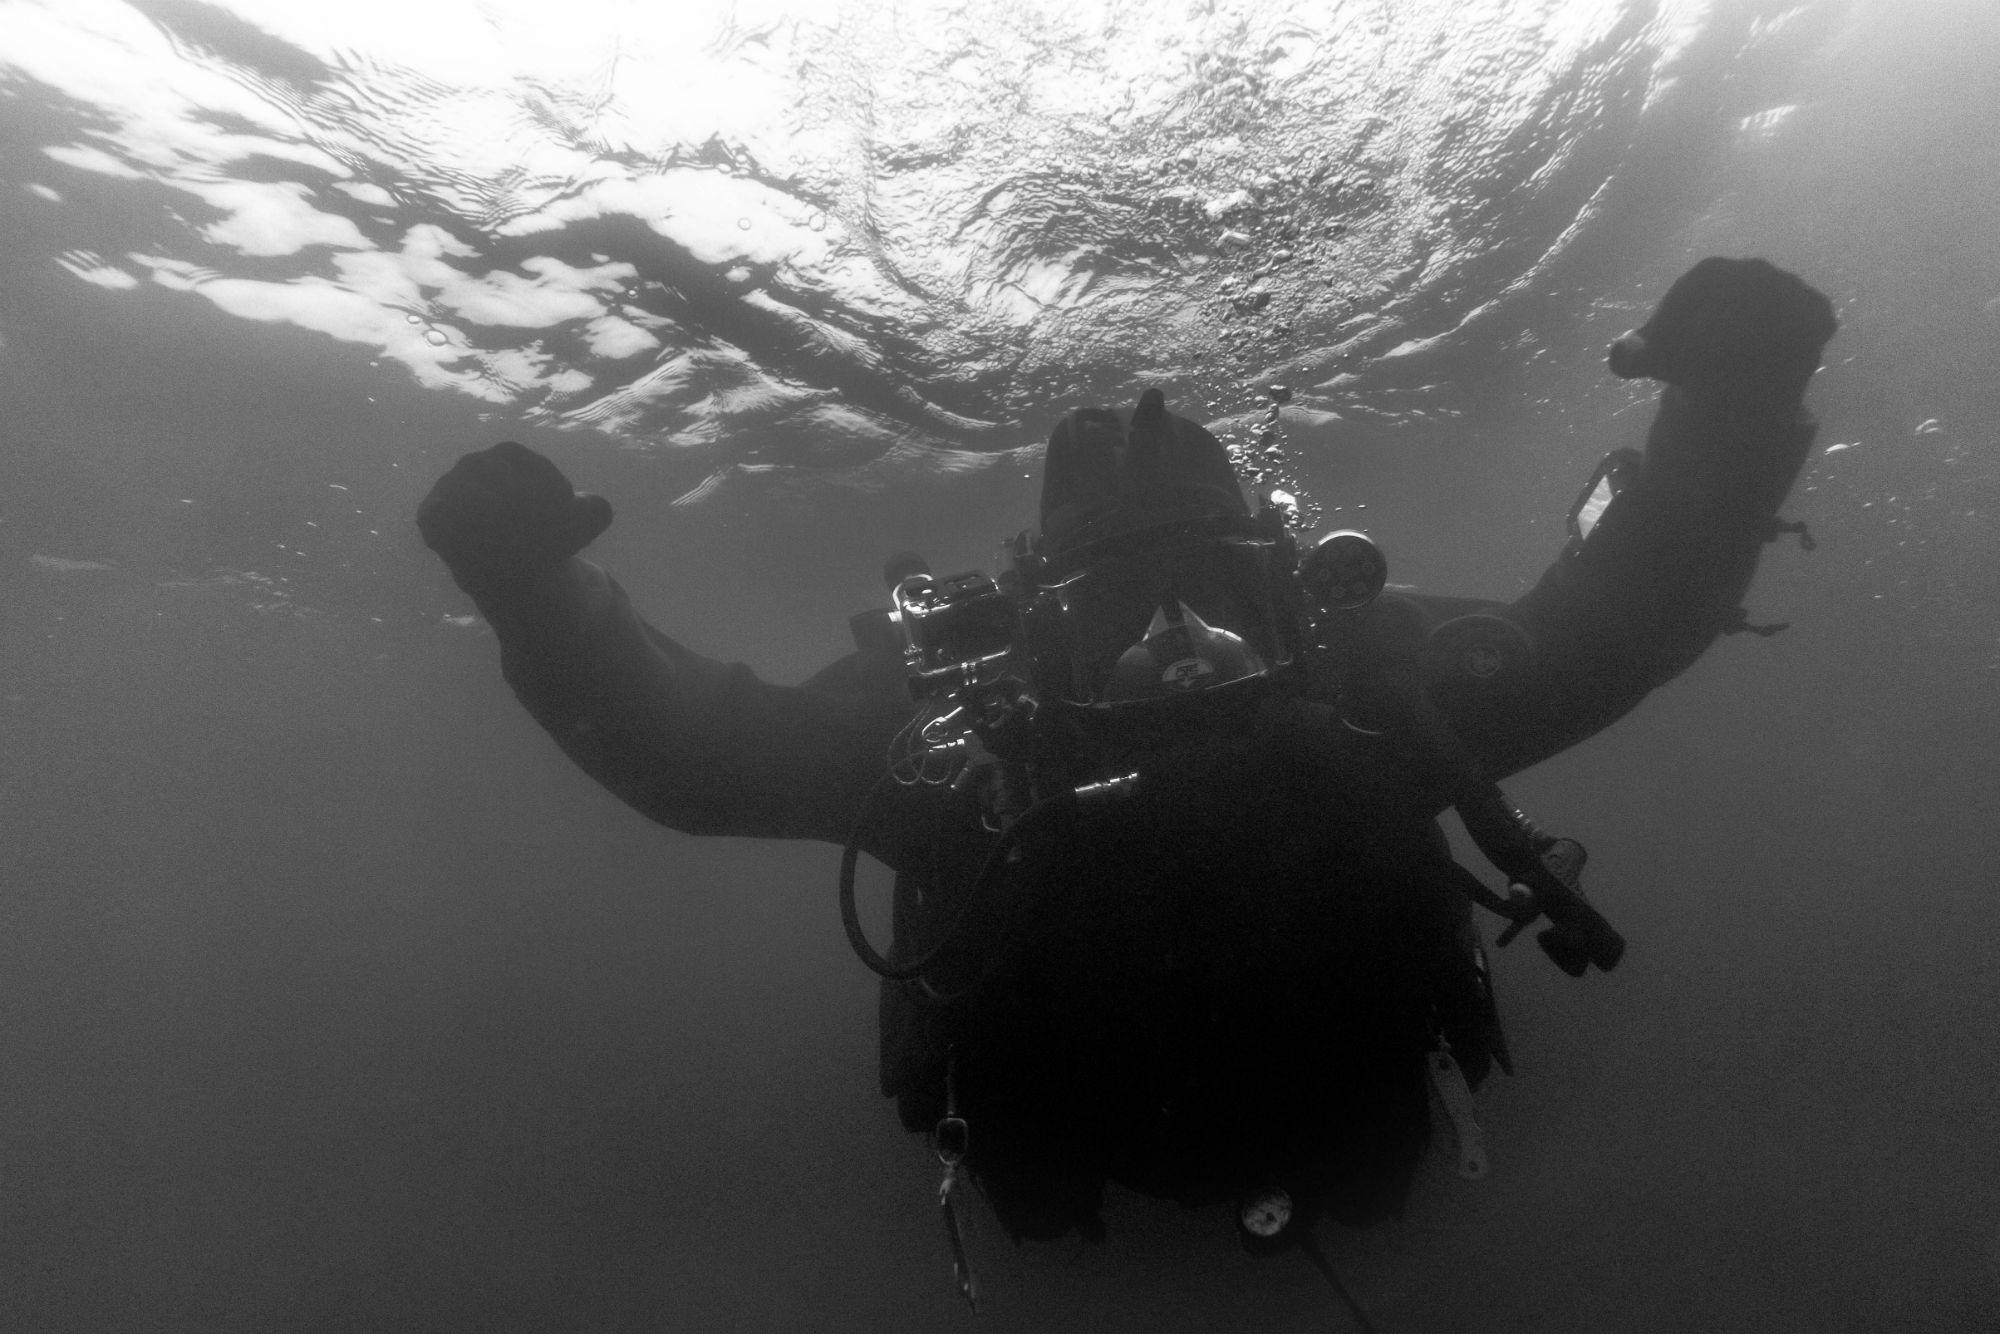 COJO Scuba Diving on the Zombie Apocalypse Course